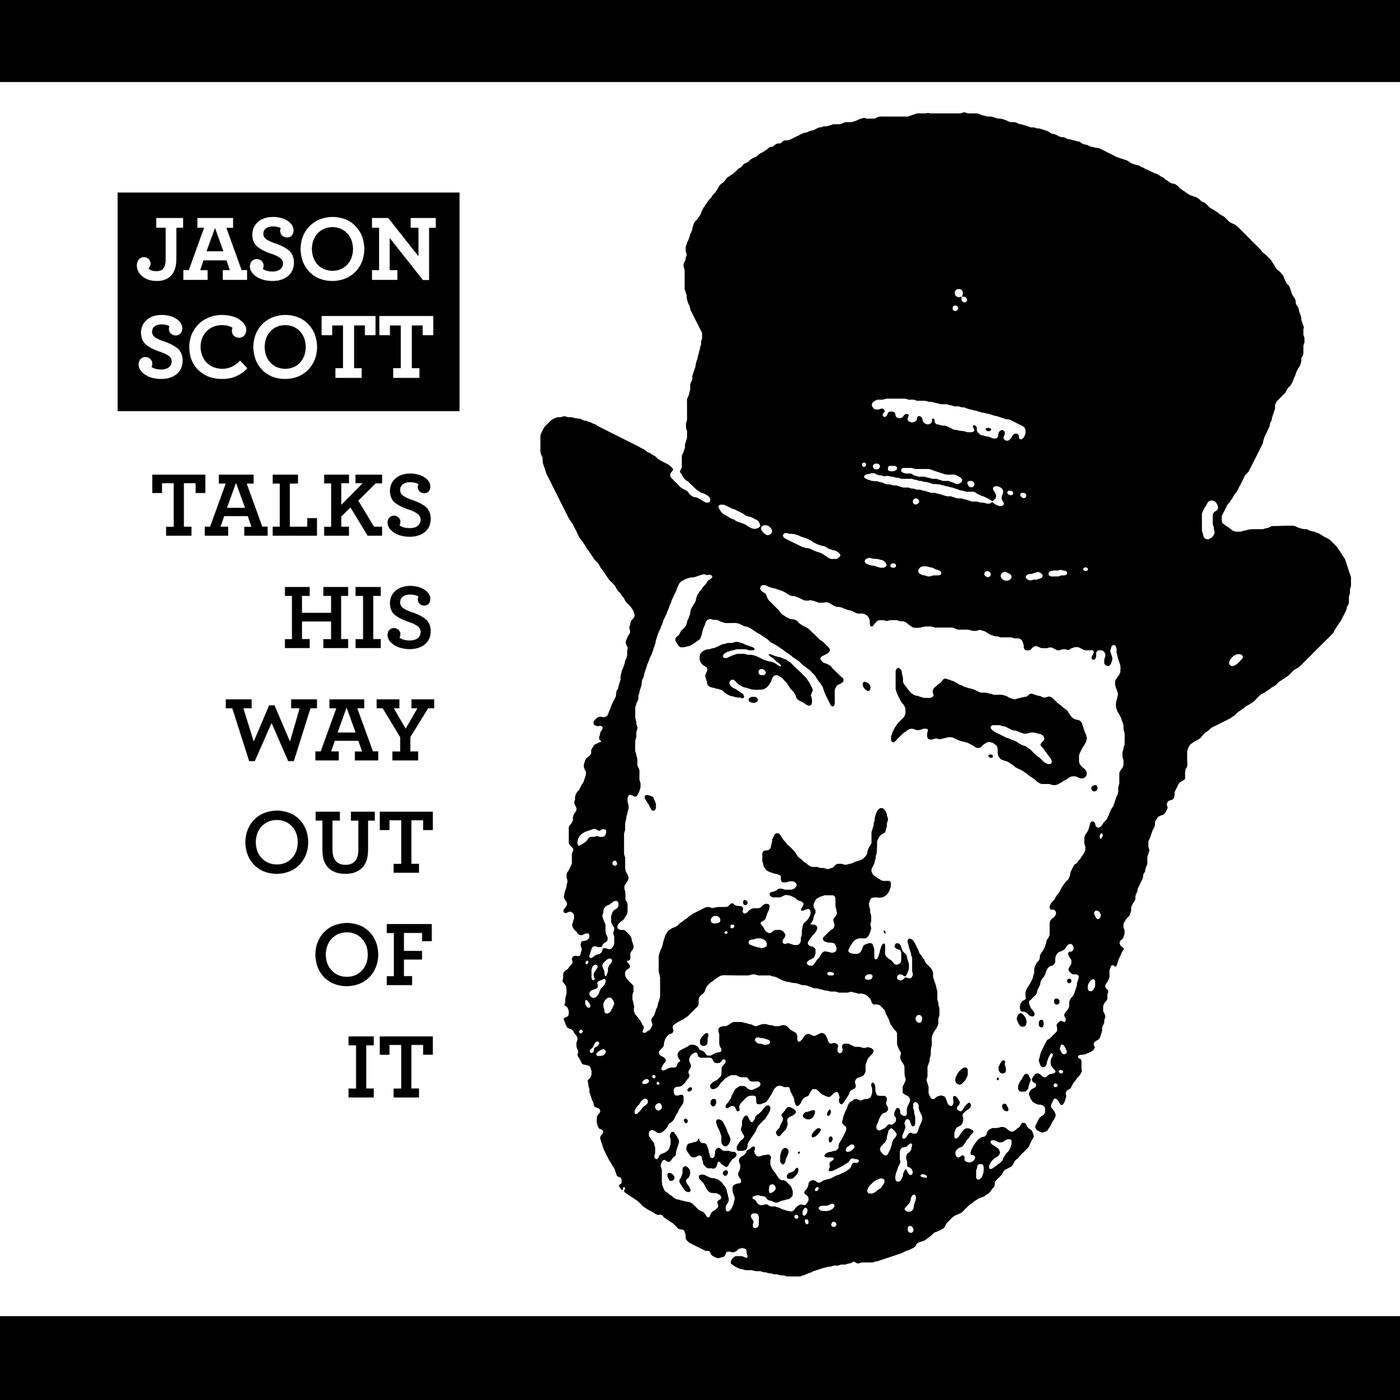 Jason Scott Talks His Way Out of It: Prototype Episode 000